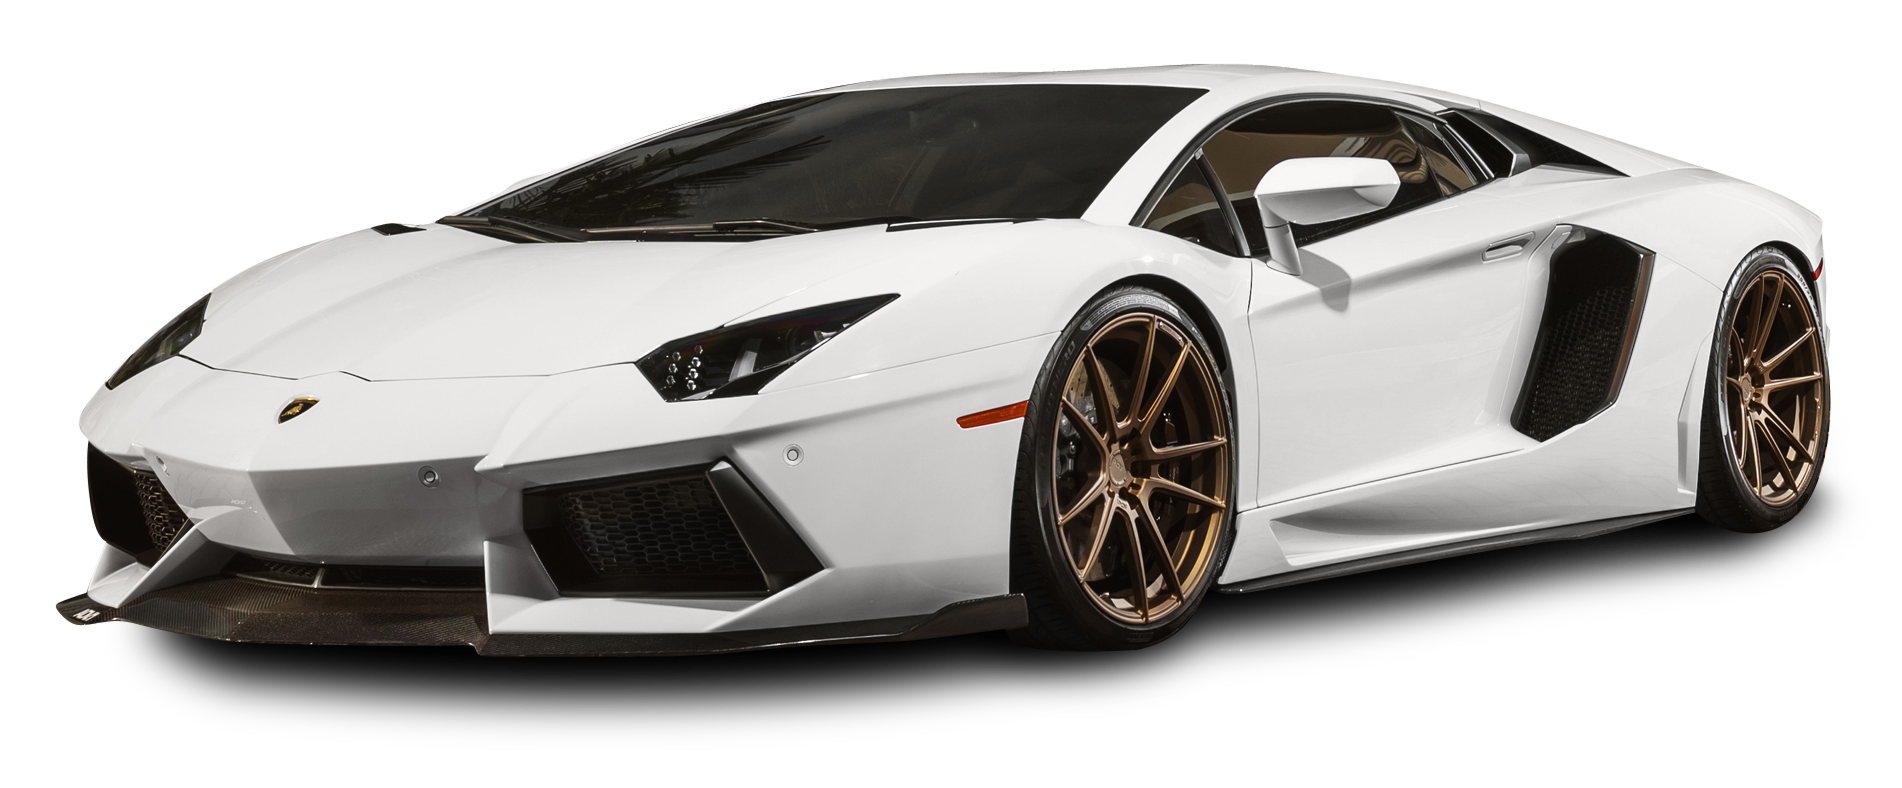 White Lamborghini Aventador Car Png Image White Lamborghini Lamborghini Car